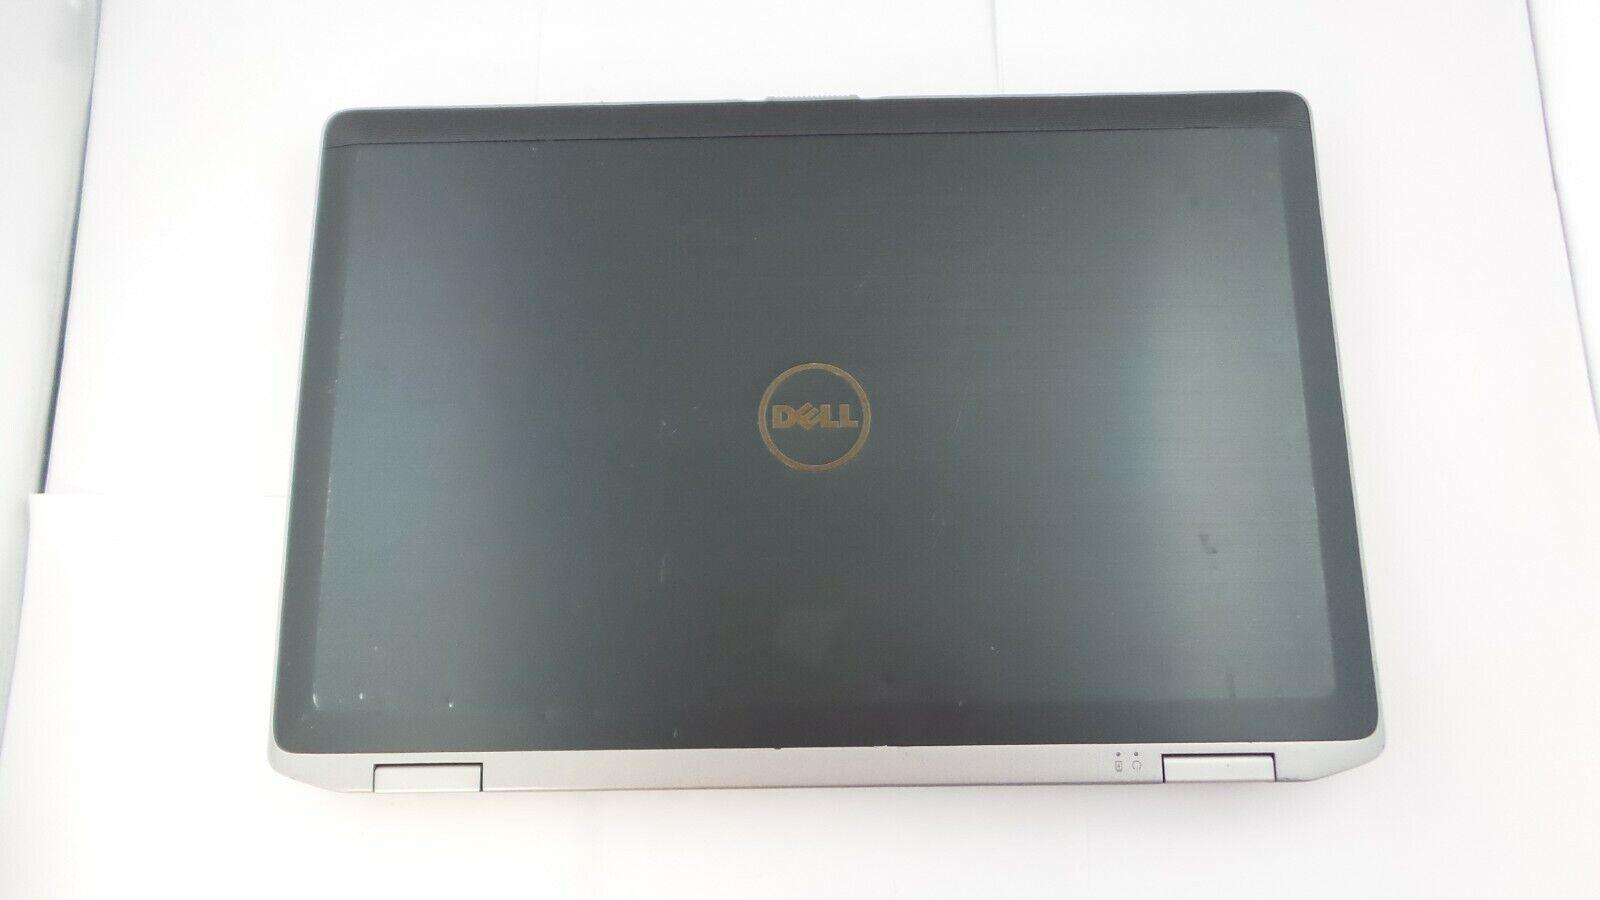 "Laptop Windows - Dell Latitude E6520 14"" i5-2520m 2.5GHz 8GB RAM 500GB HDD Windows 10 Home"